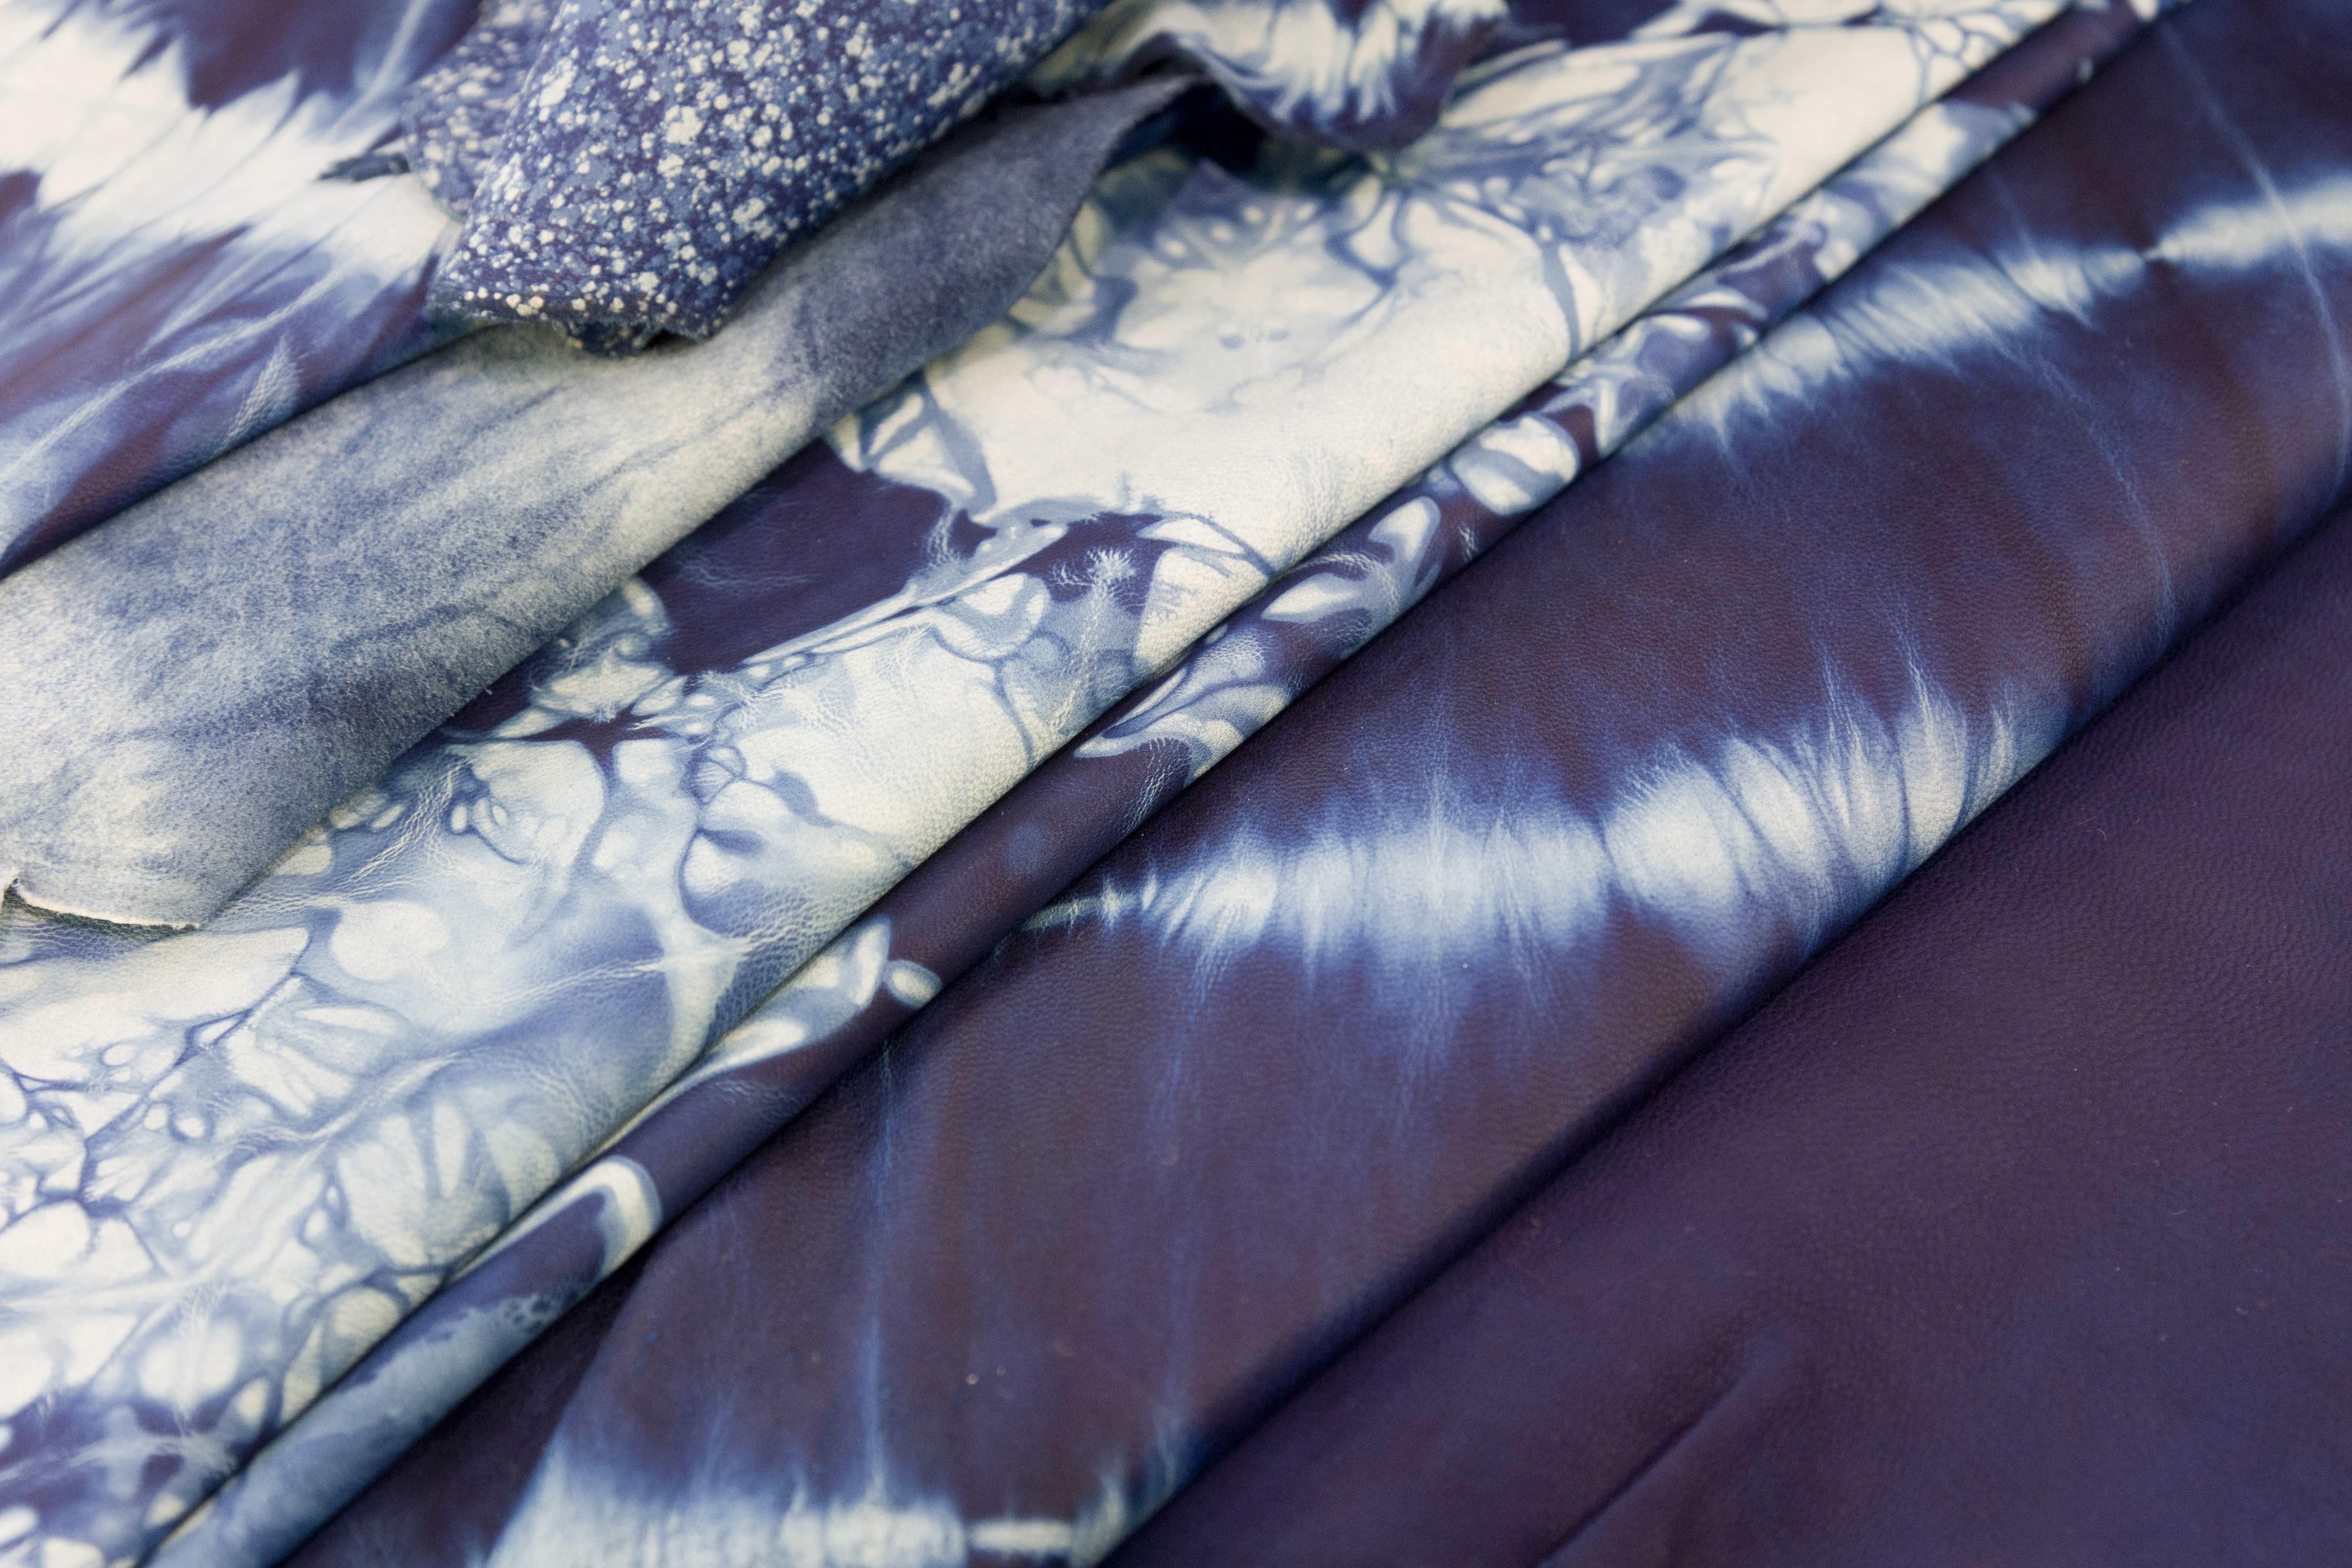 Indigo-dyed leathers using kimono techniques by Sukumo Leather.